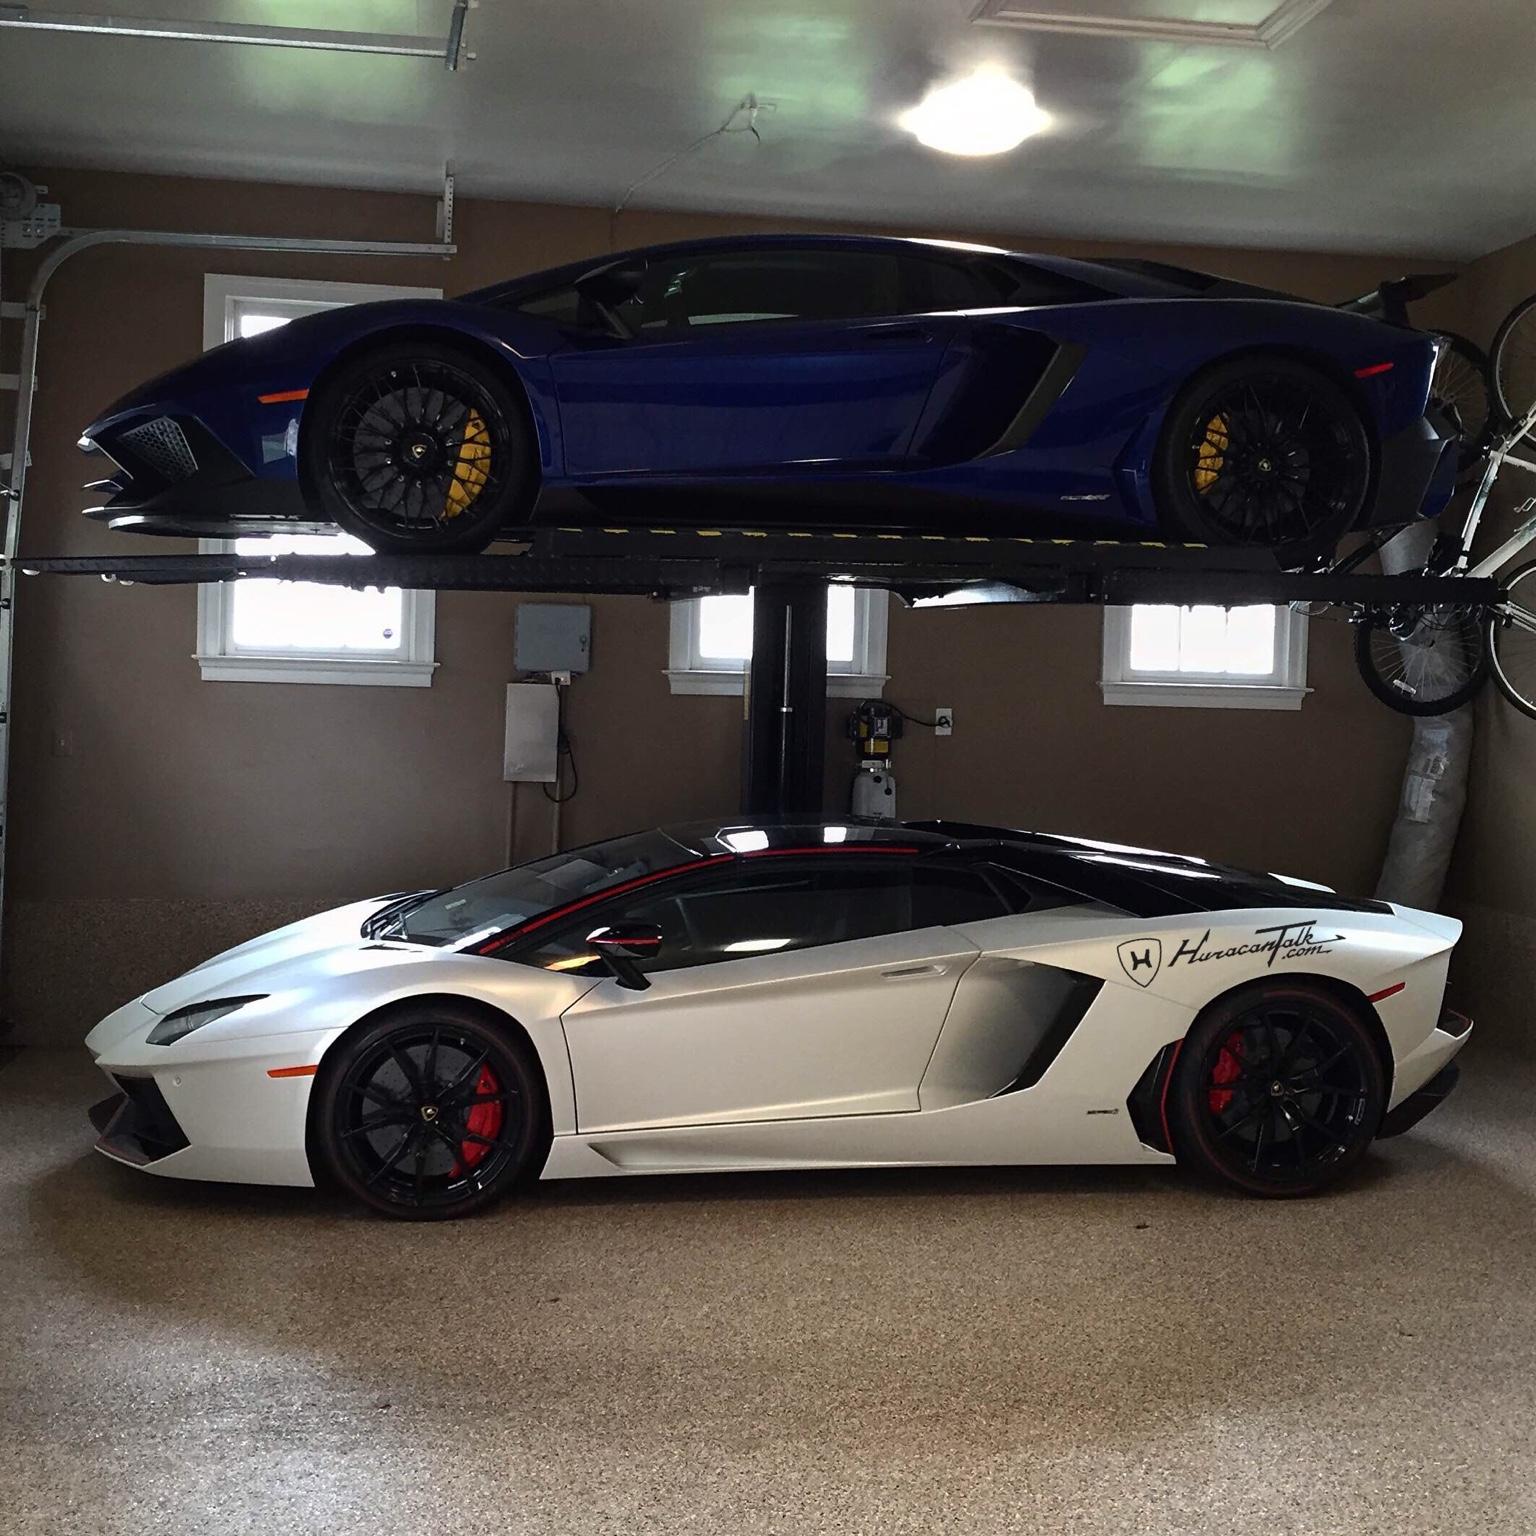 Lamborghini Huracan Garage Picture Thread Where Do You